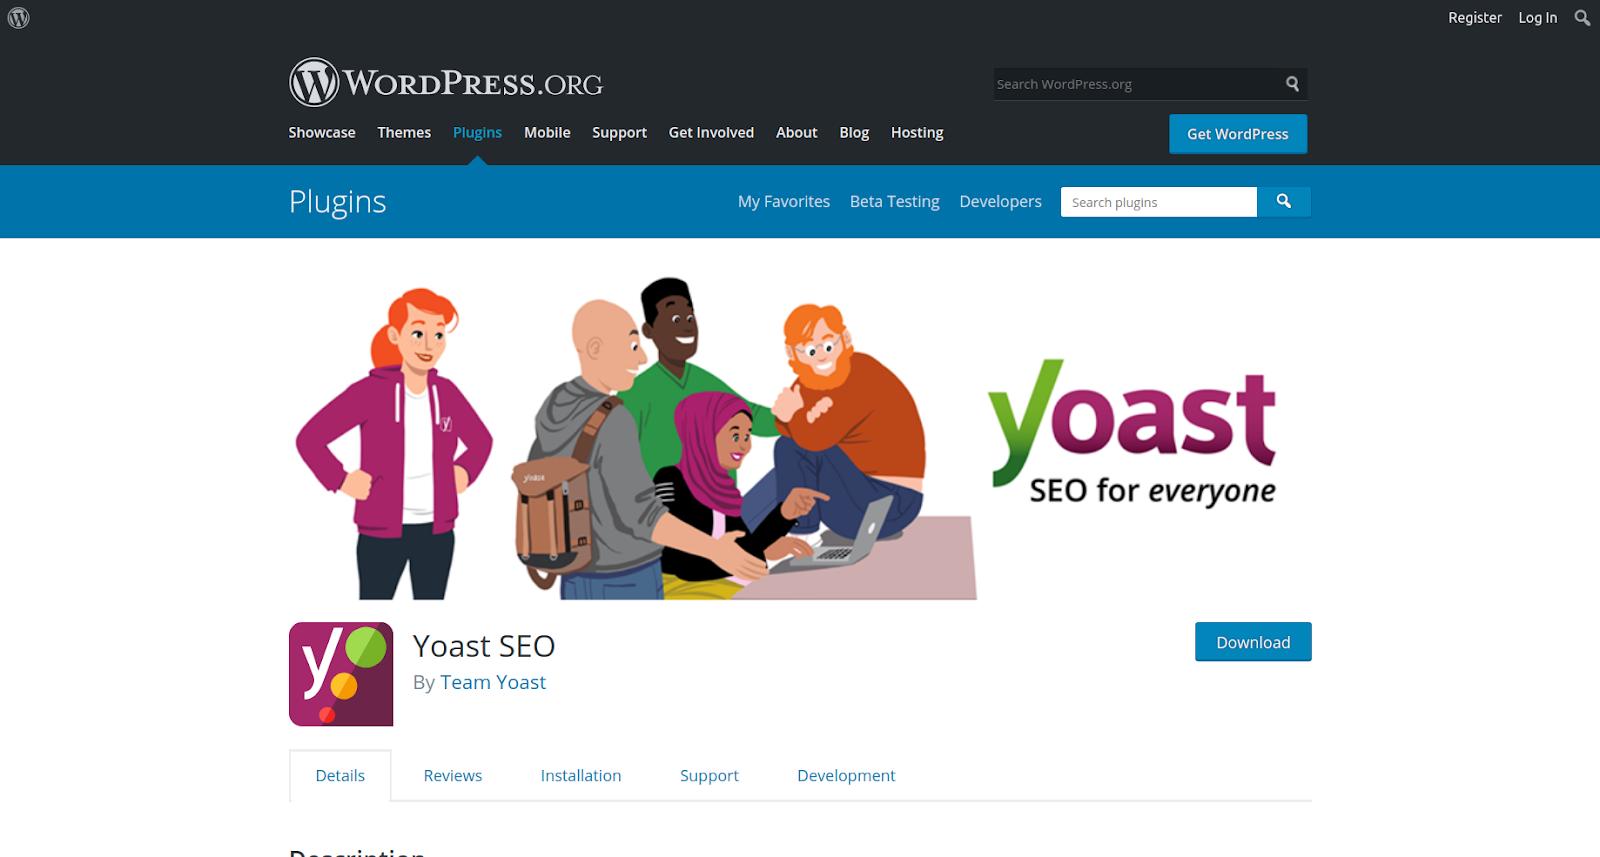 yoast wordpress seo plugin page